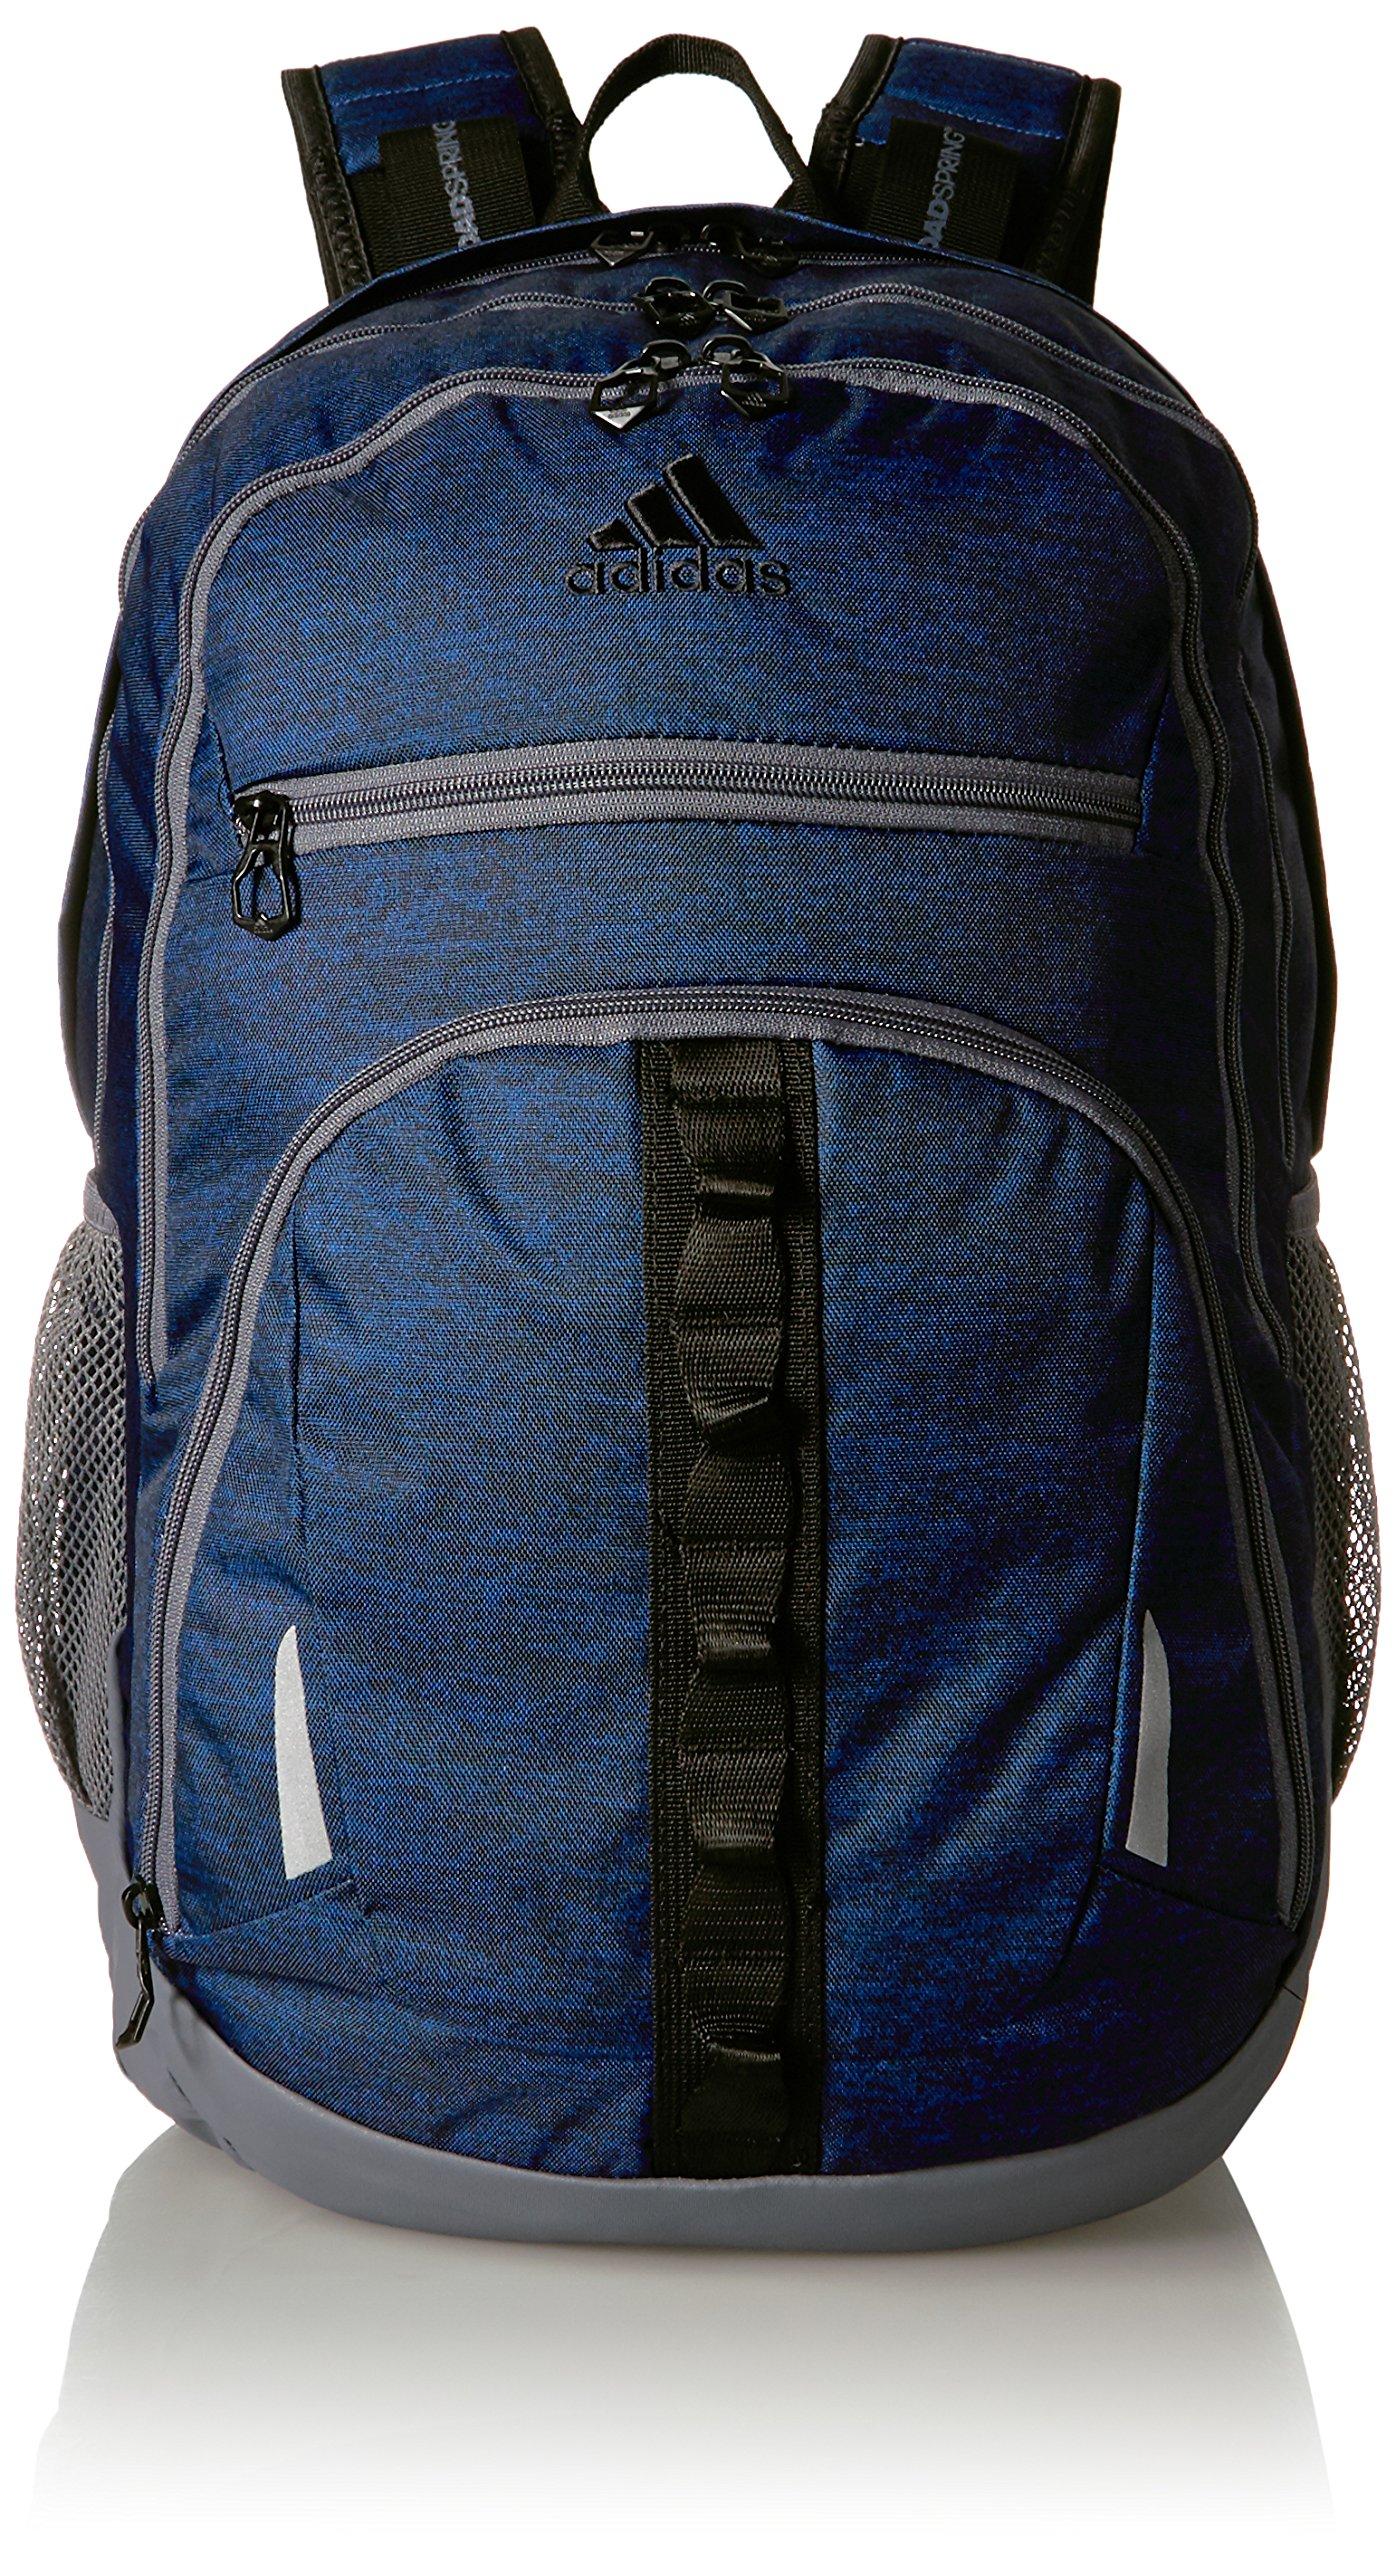 Adidas Prime Iv Backpack Exercisen